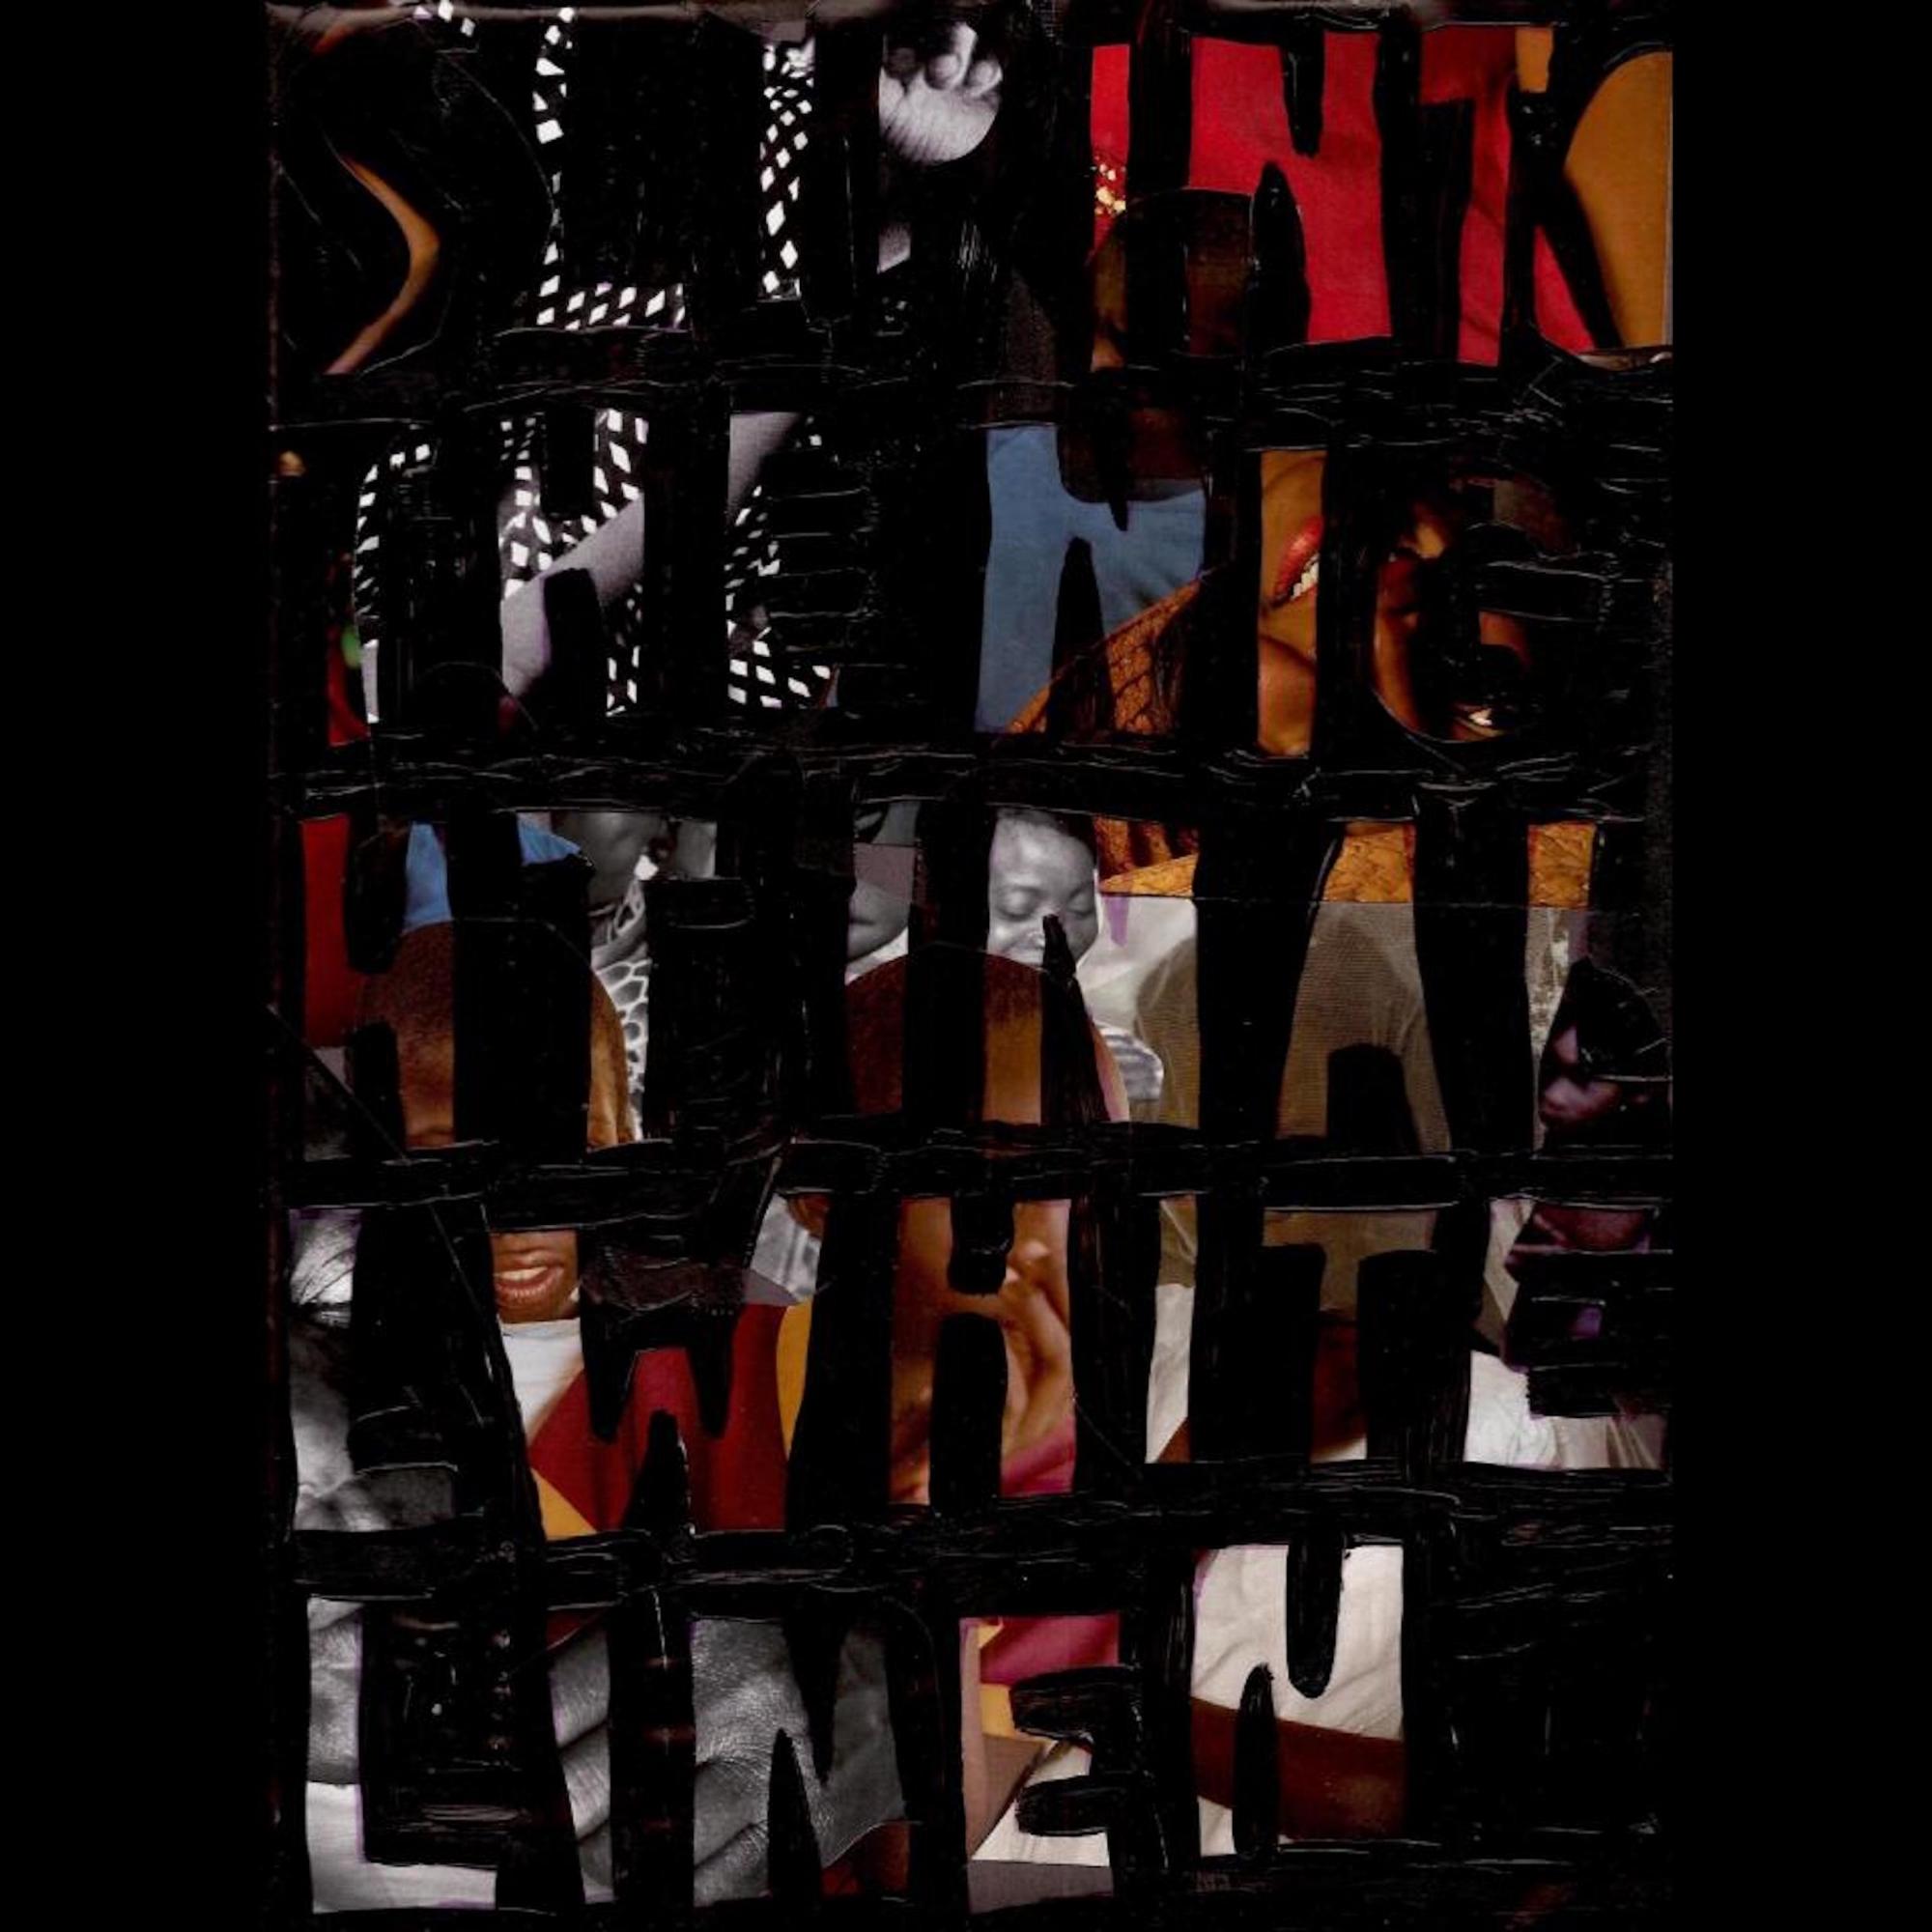 The Shining - Artwork by Lukaza Branfman-Verissimo